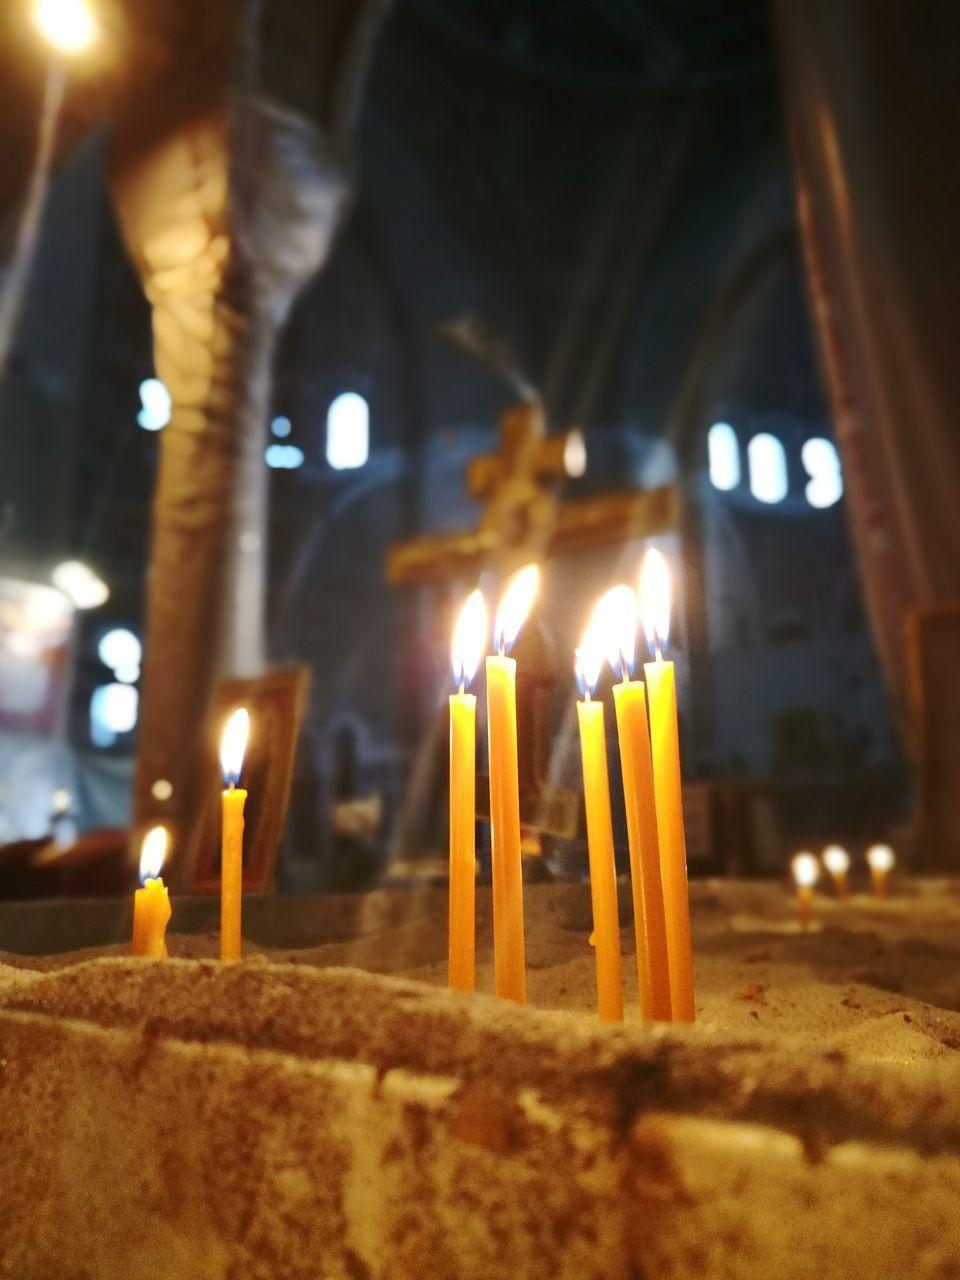 candle, flame, burning, glowing, indoors, illuminated, heat - temperature, religion, spirituality, celebration, place of worship, no people, close-up, night, yellow, altar